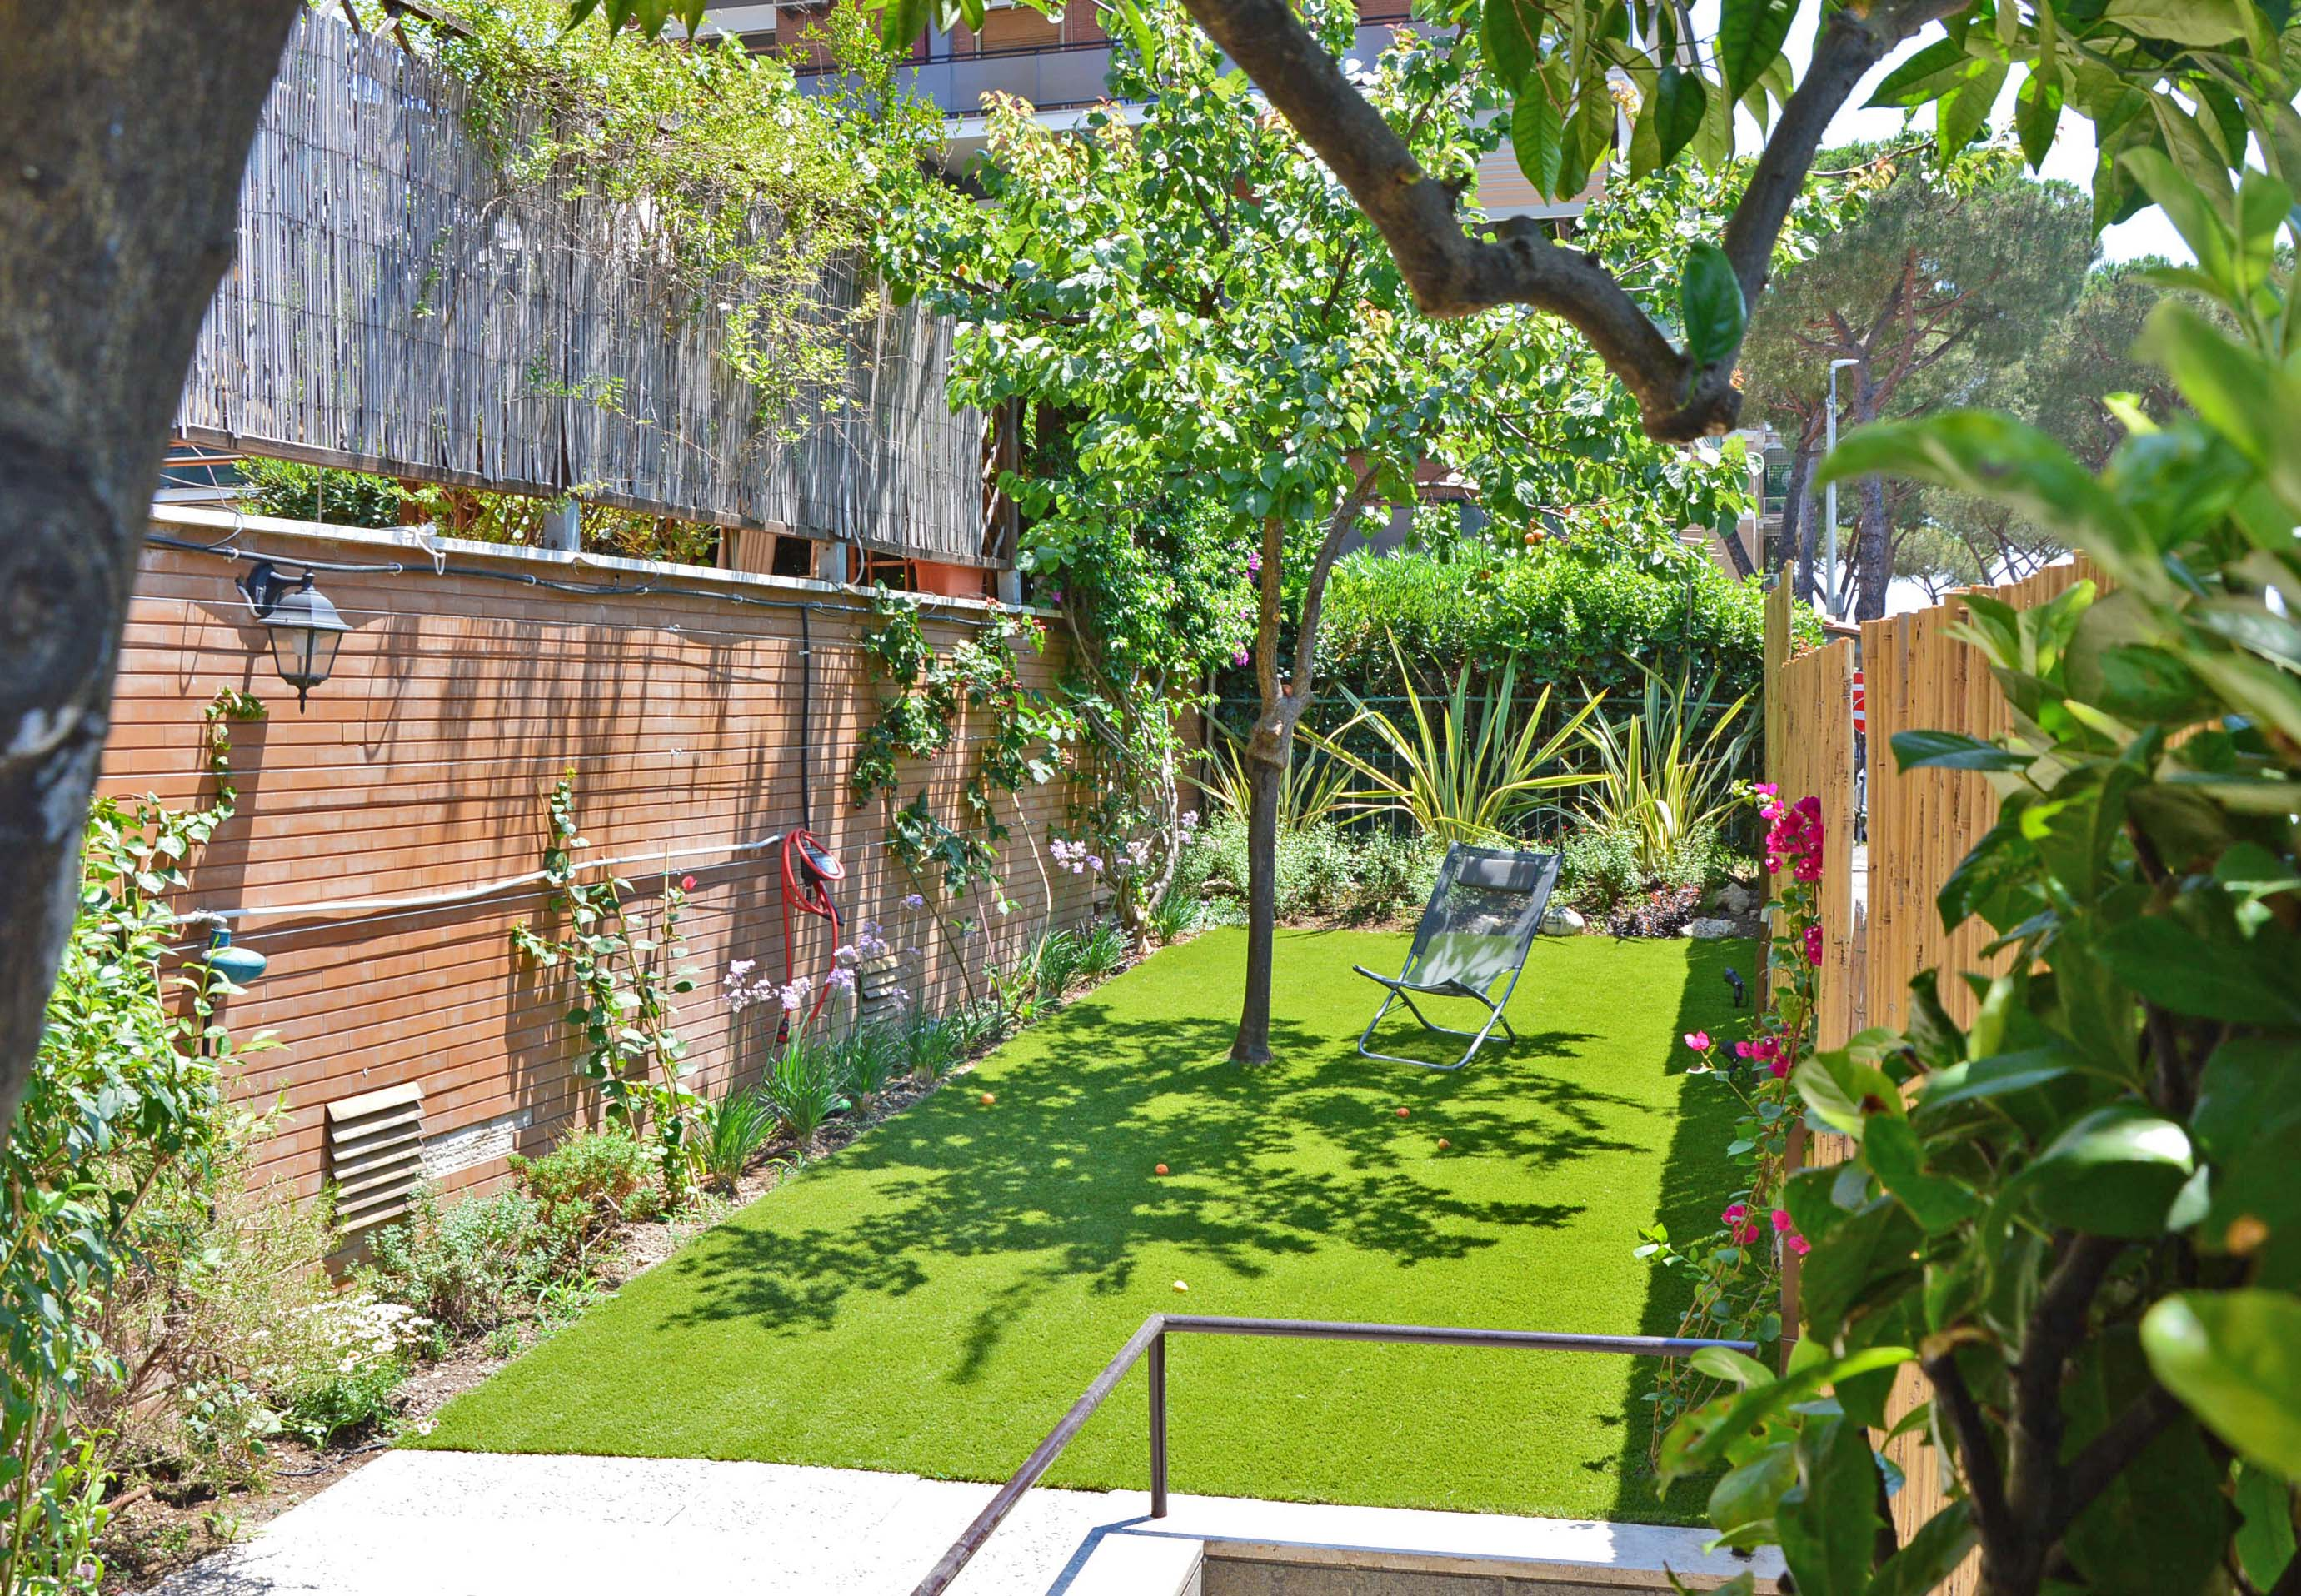 Good piccolo giardino in citt home giardini piccolo - Giardino piccolo foto ...